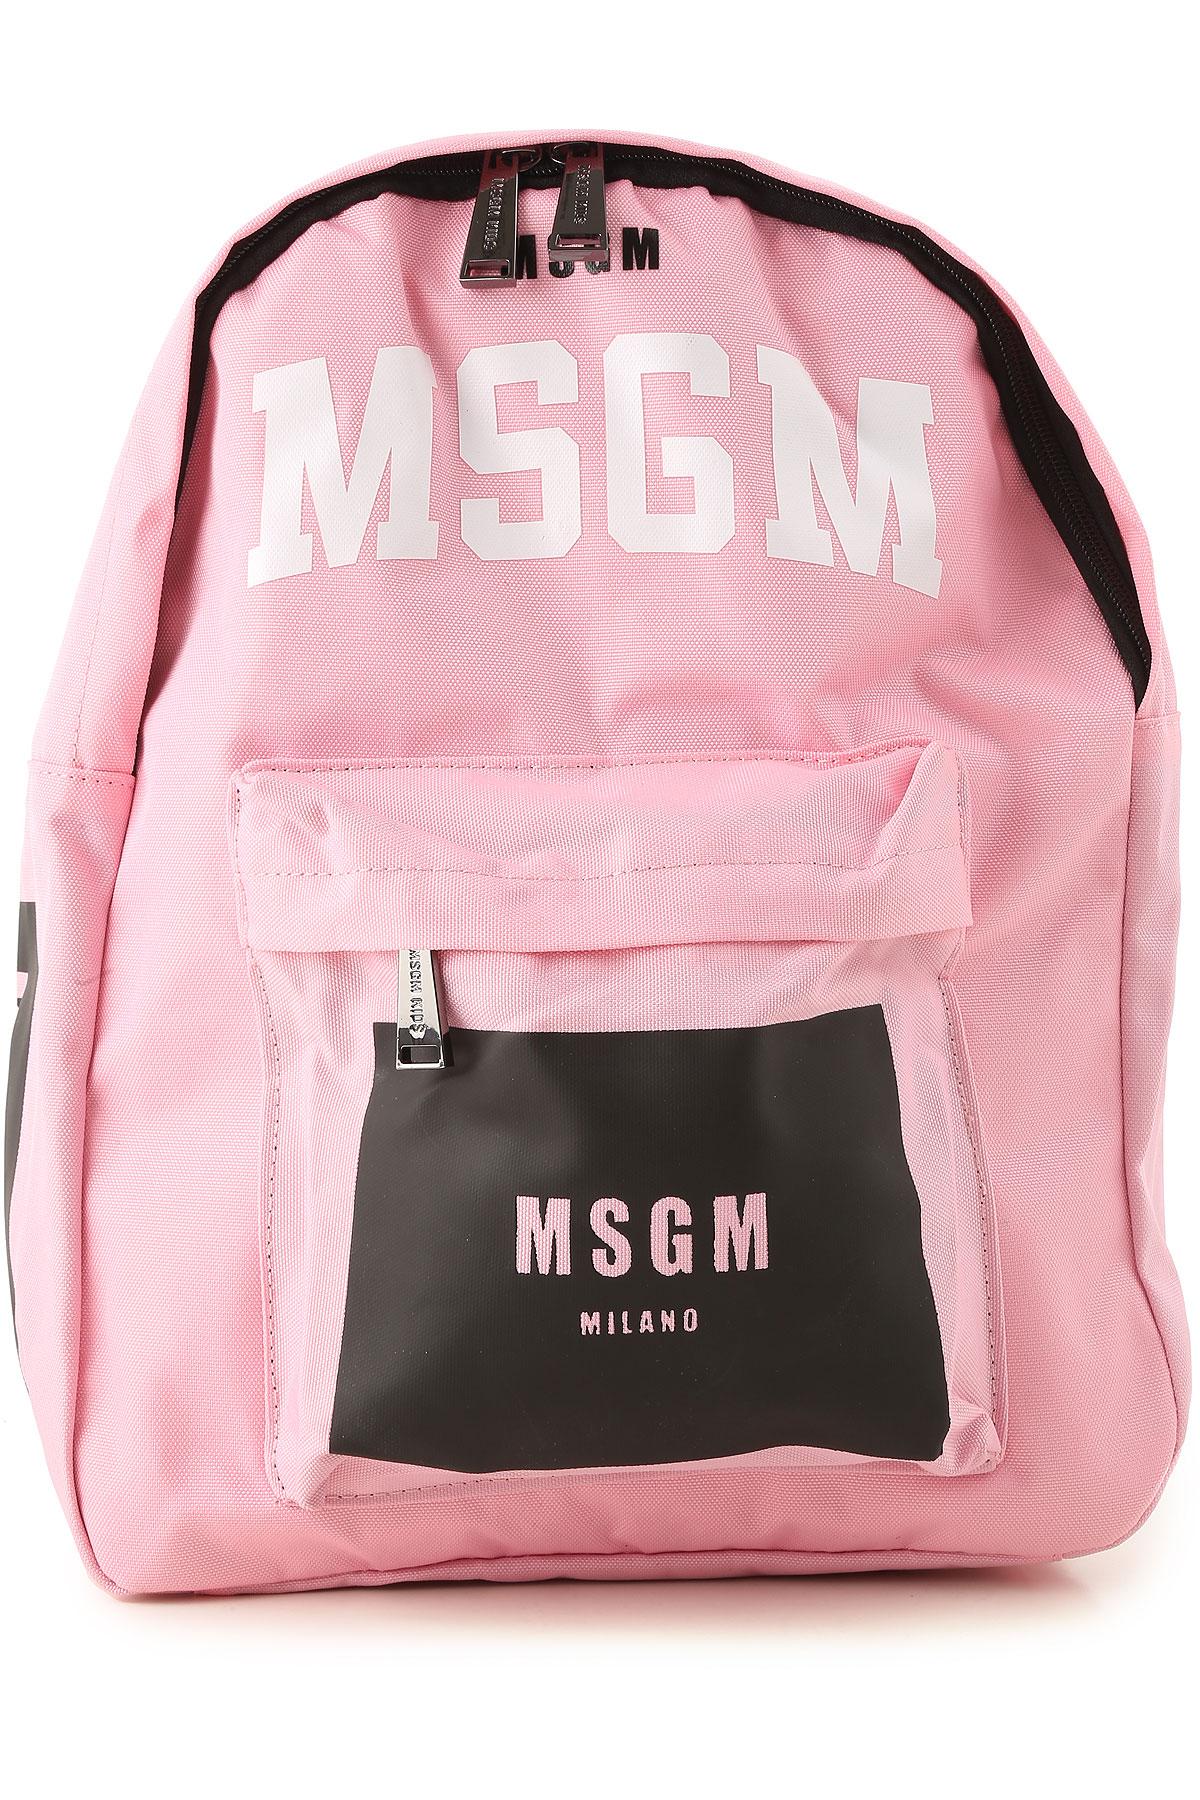 Image of MSGM Girls Handbag, Pink, Nylon, 2017